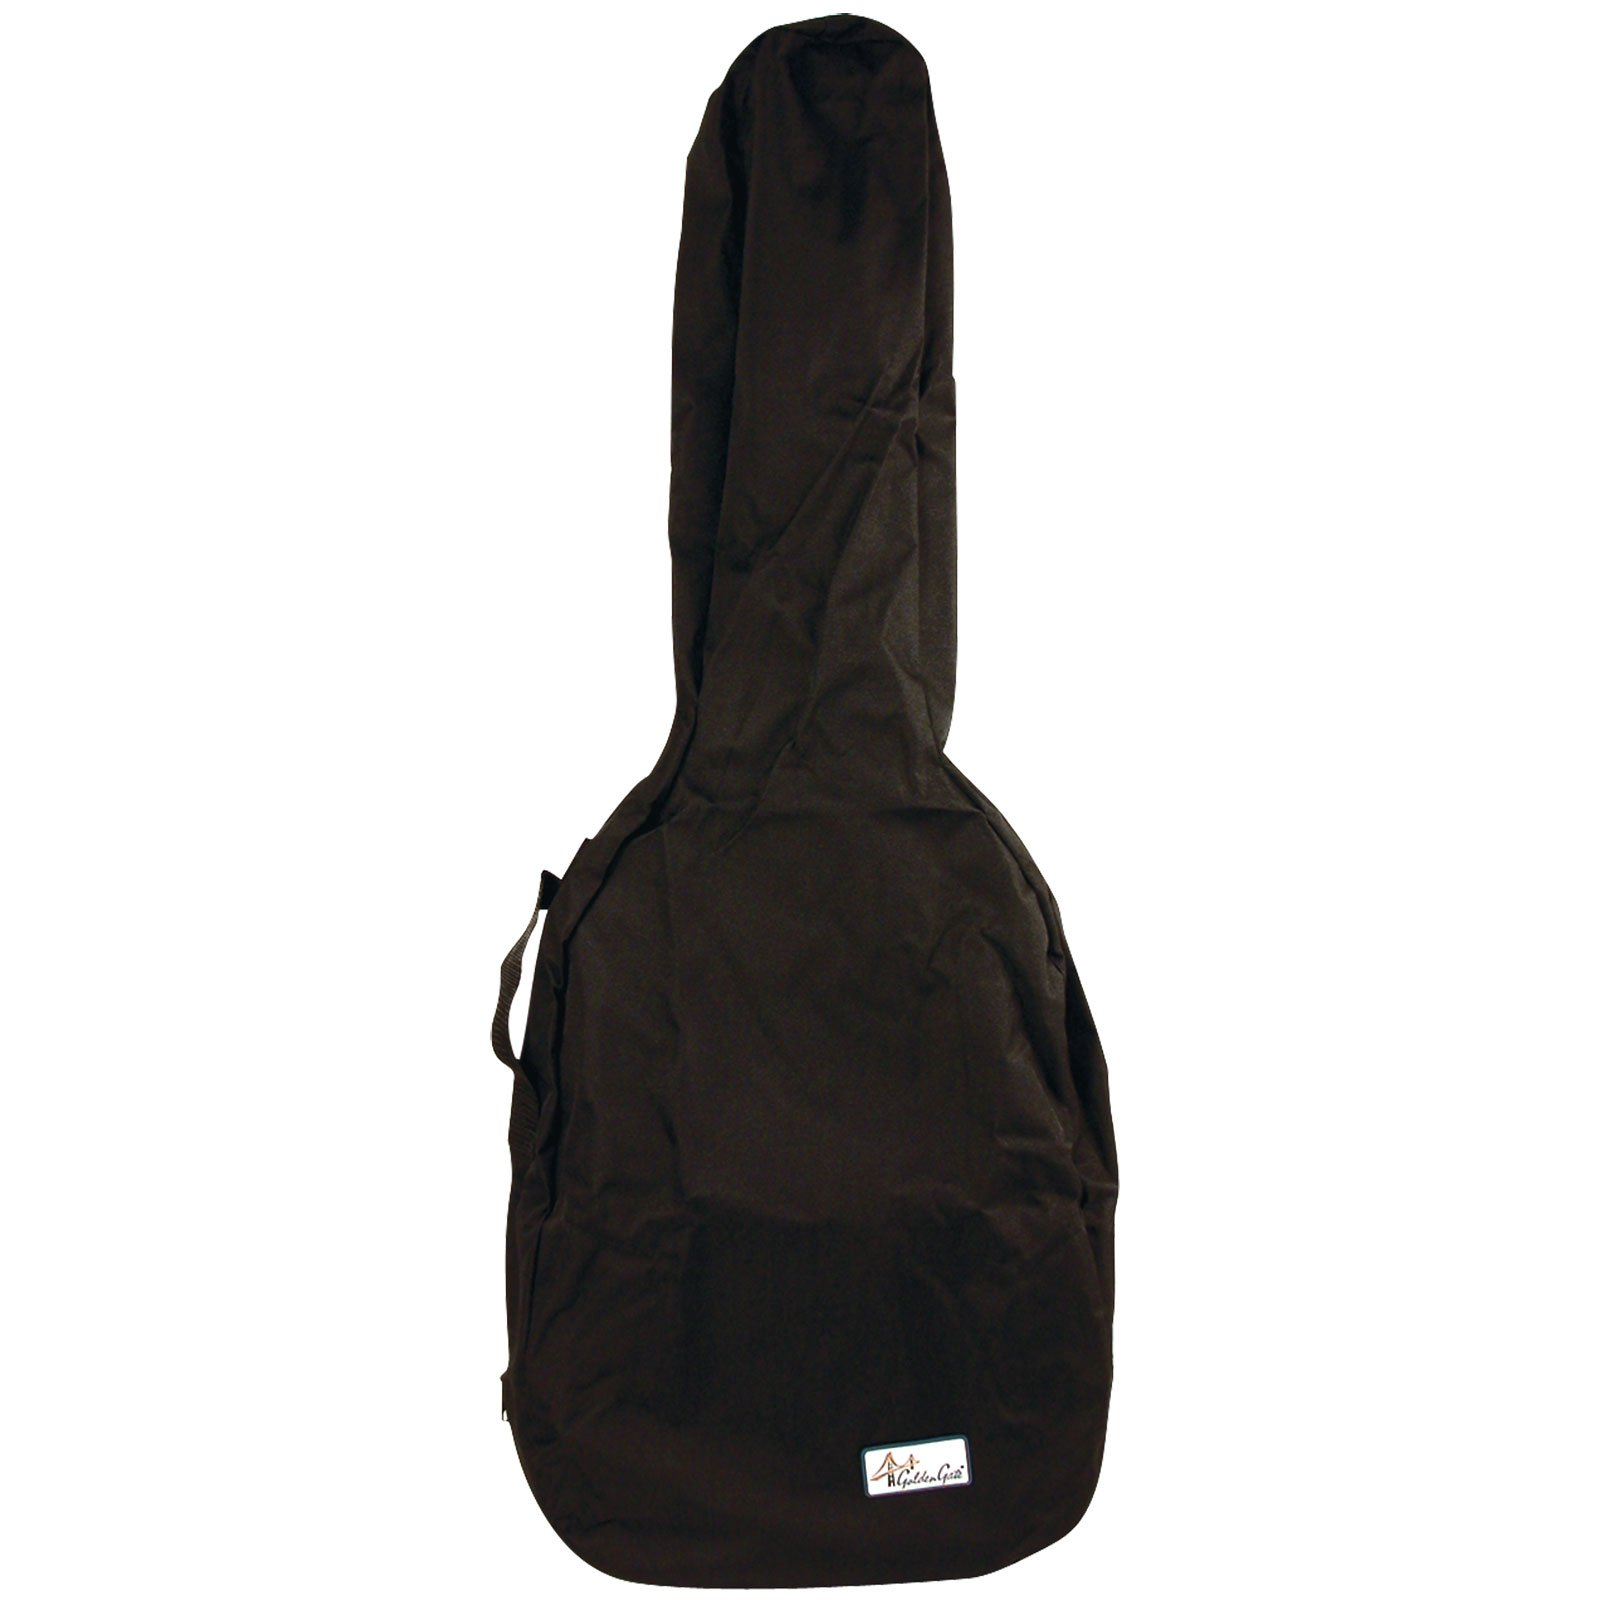 Golden Gate CG-052 Economy Classical/Resophonic Guitar Gig Bag - 3/4 Size